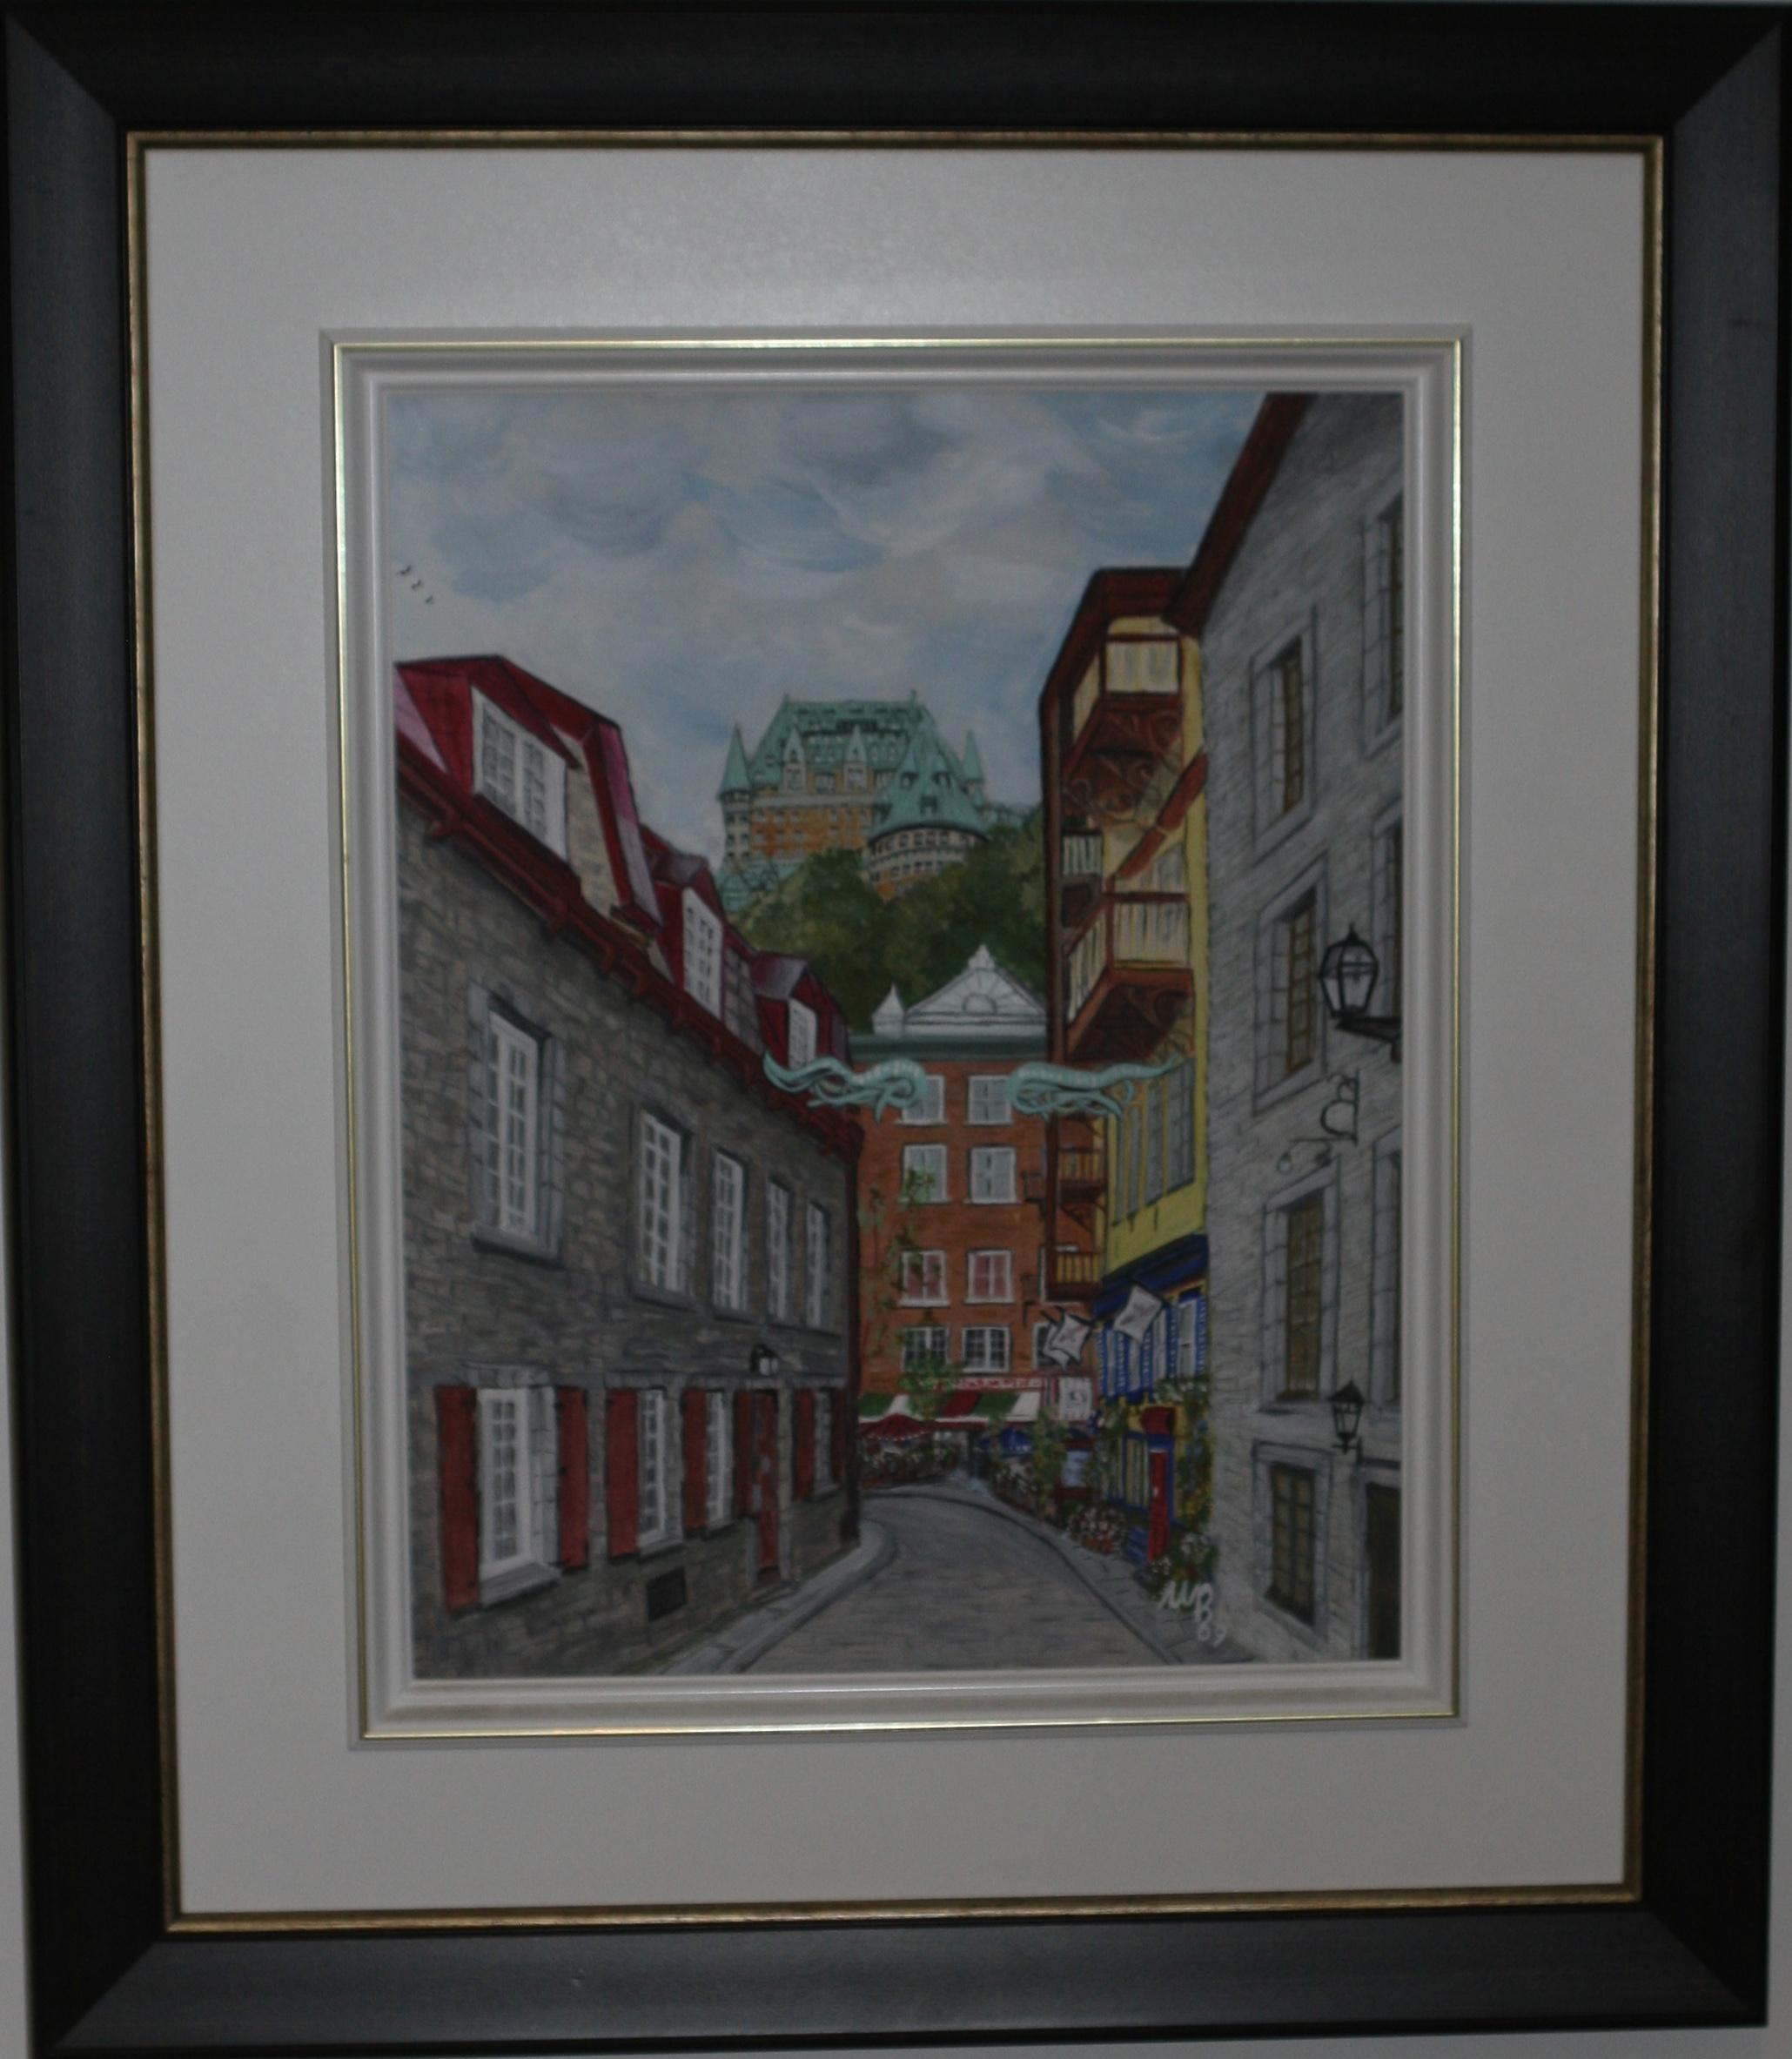 Walking through Quebec City by Margot Brodkorb